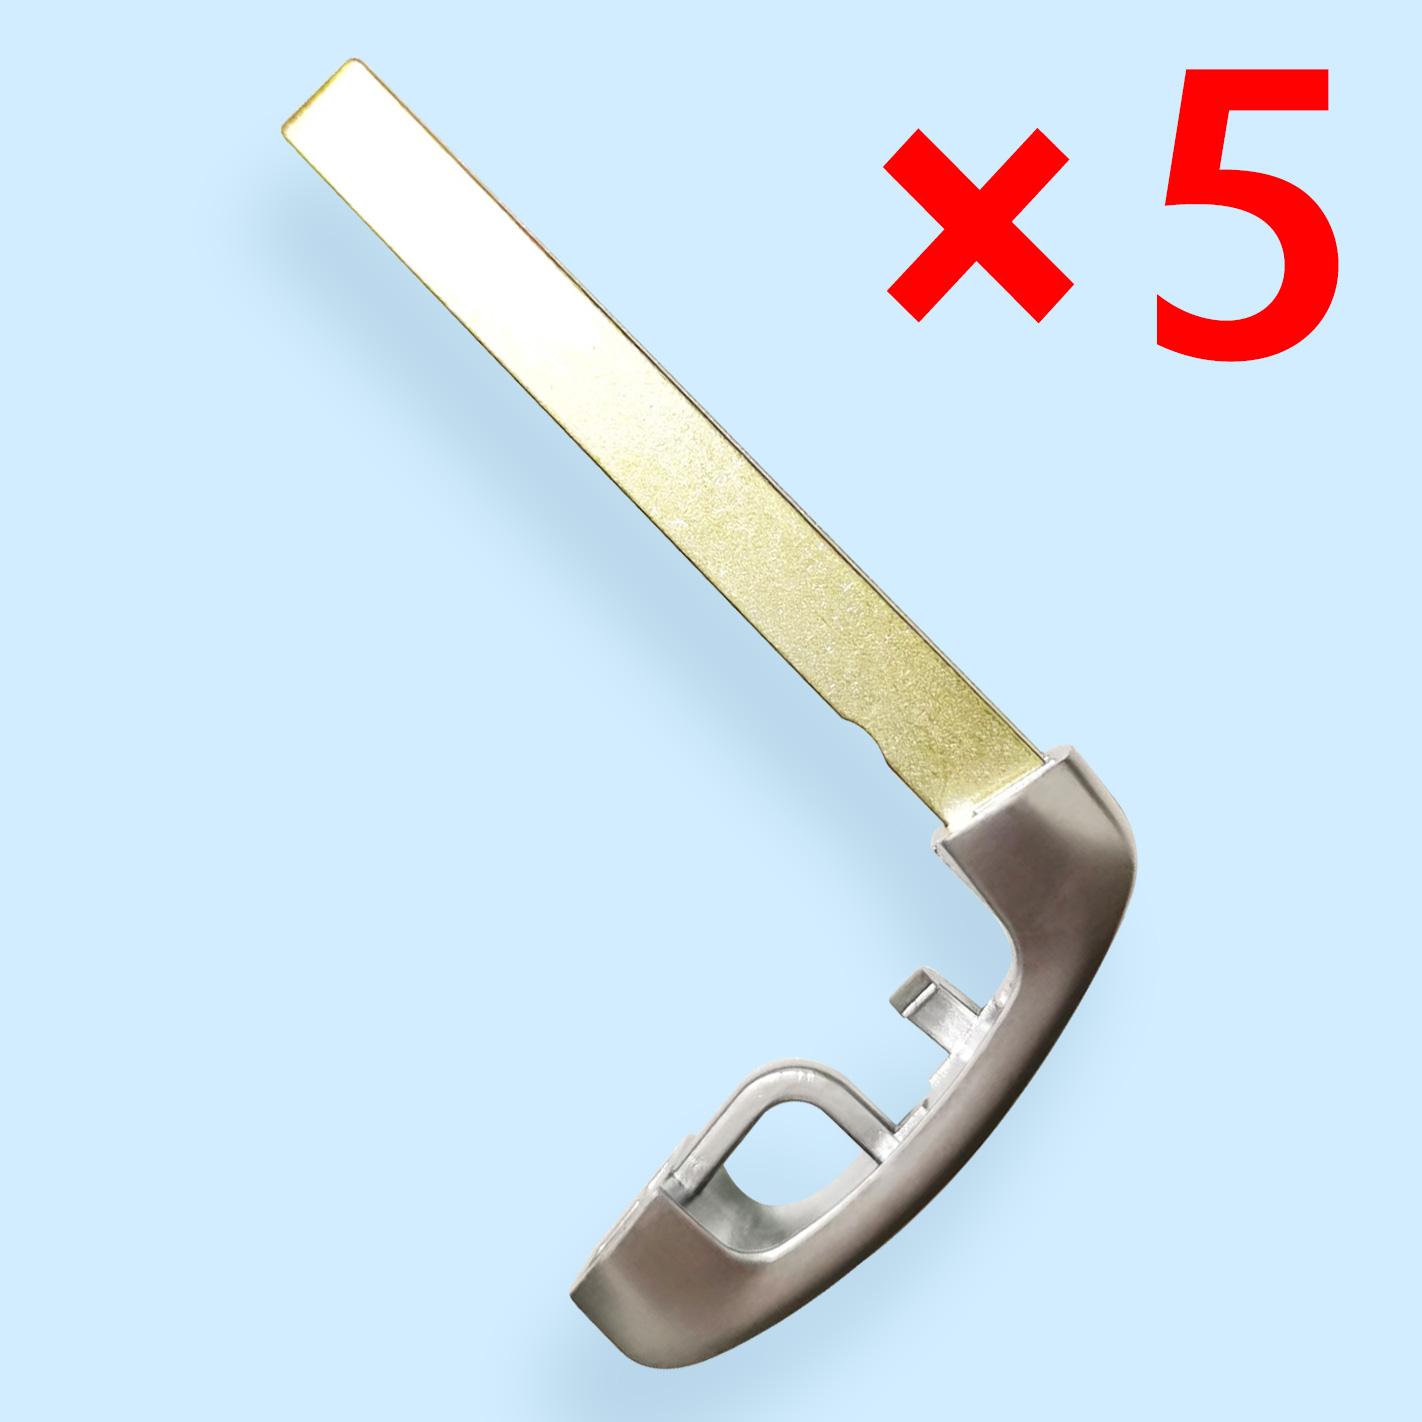 HU100R Emergency Key Blade for BMW CAS4 - Pack of 5